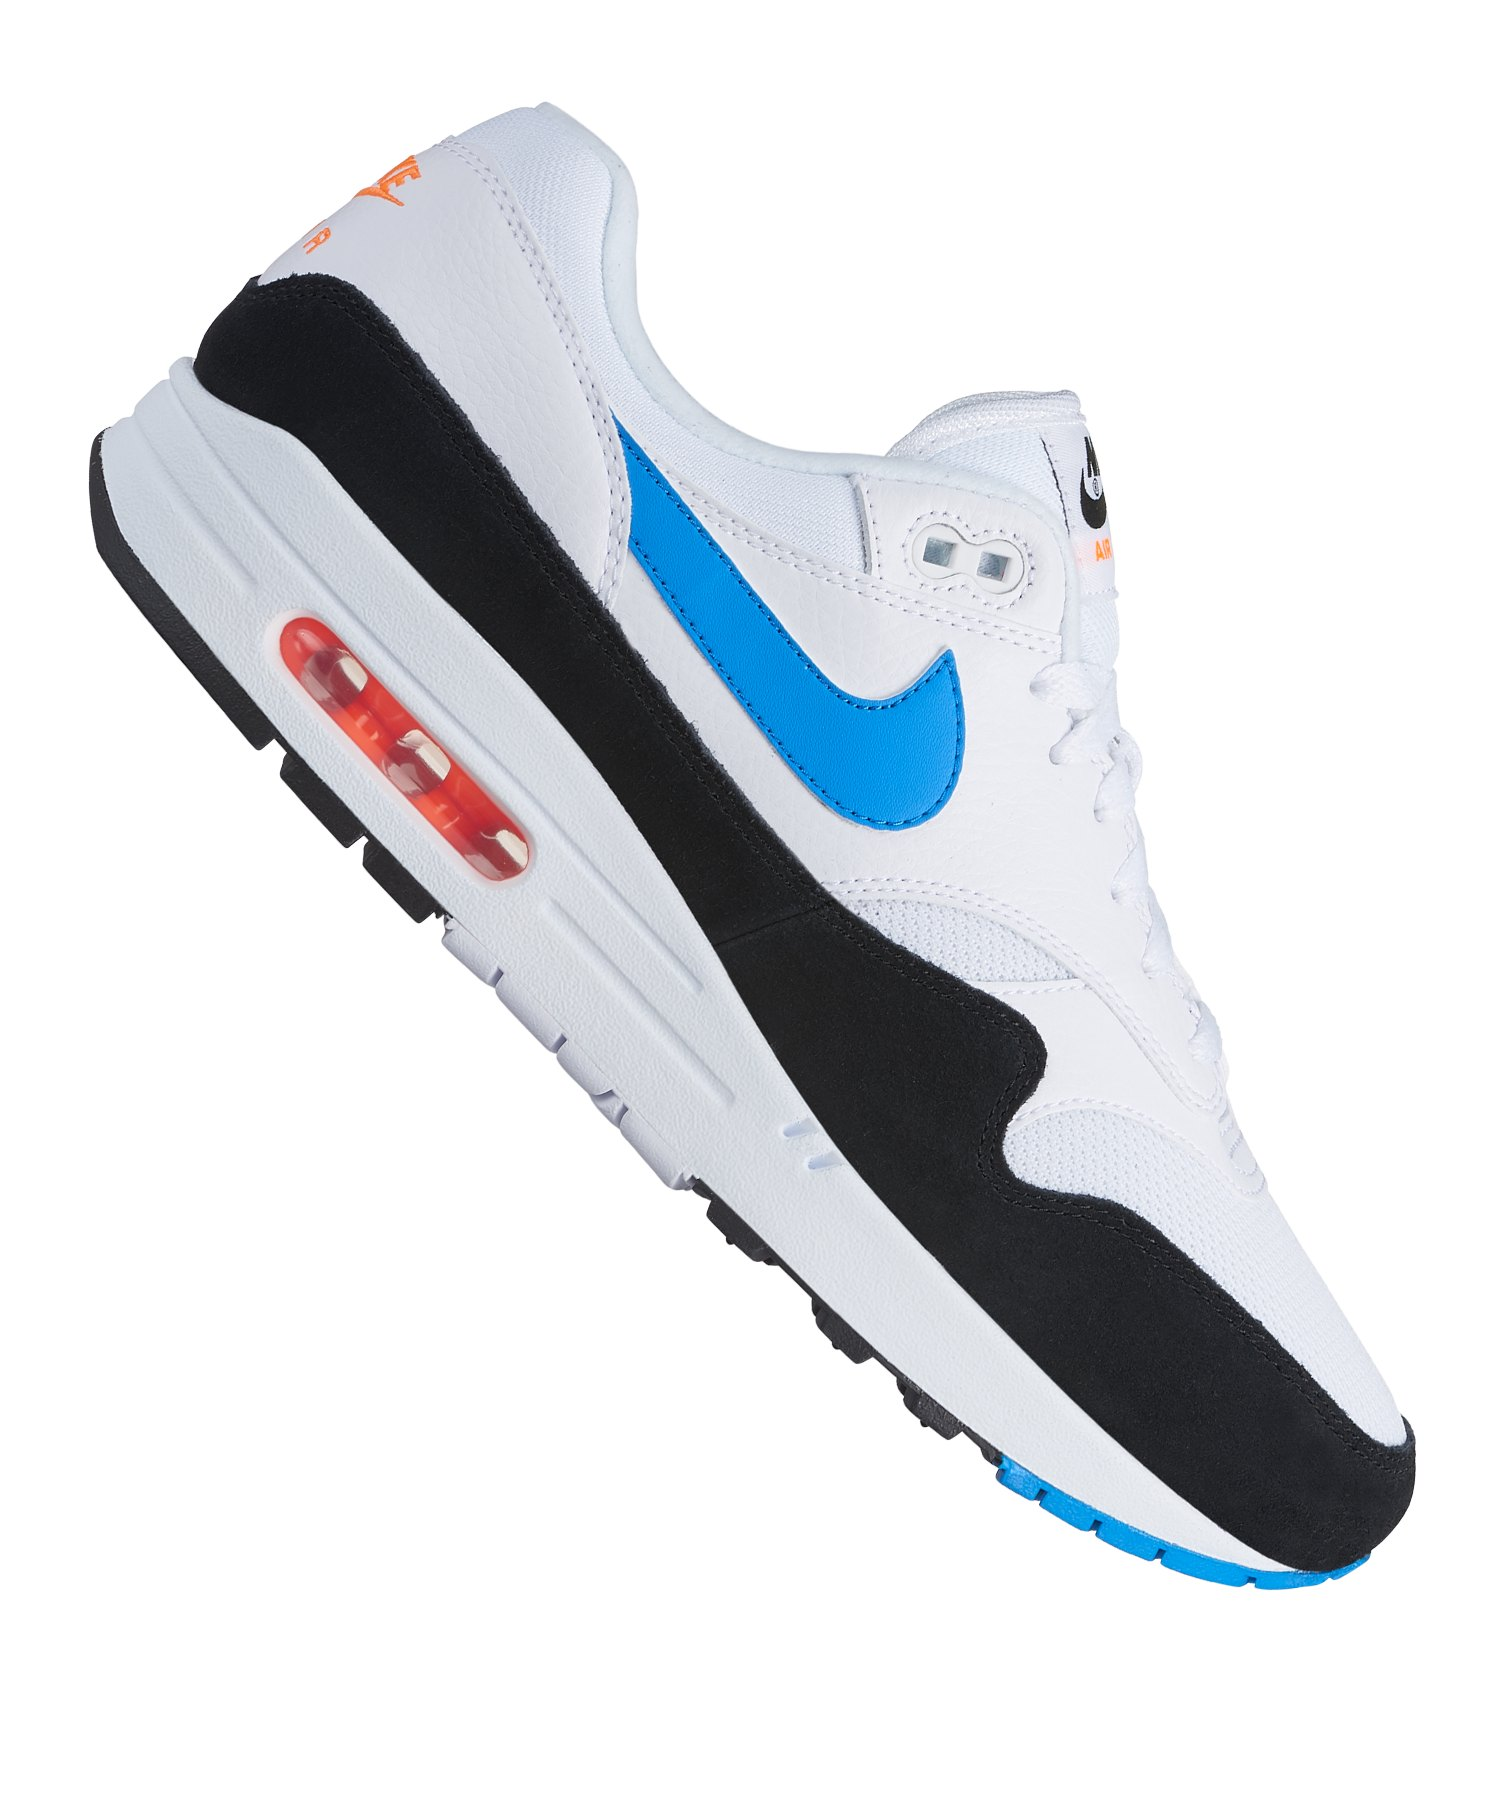 finest selection aedac 63411 Nike Air Max 1 Sneaker Weiss Schwarz Blau F112 - Weiss